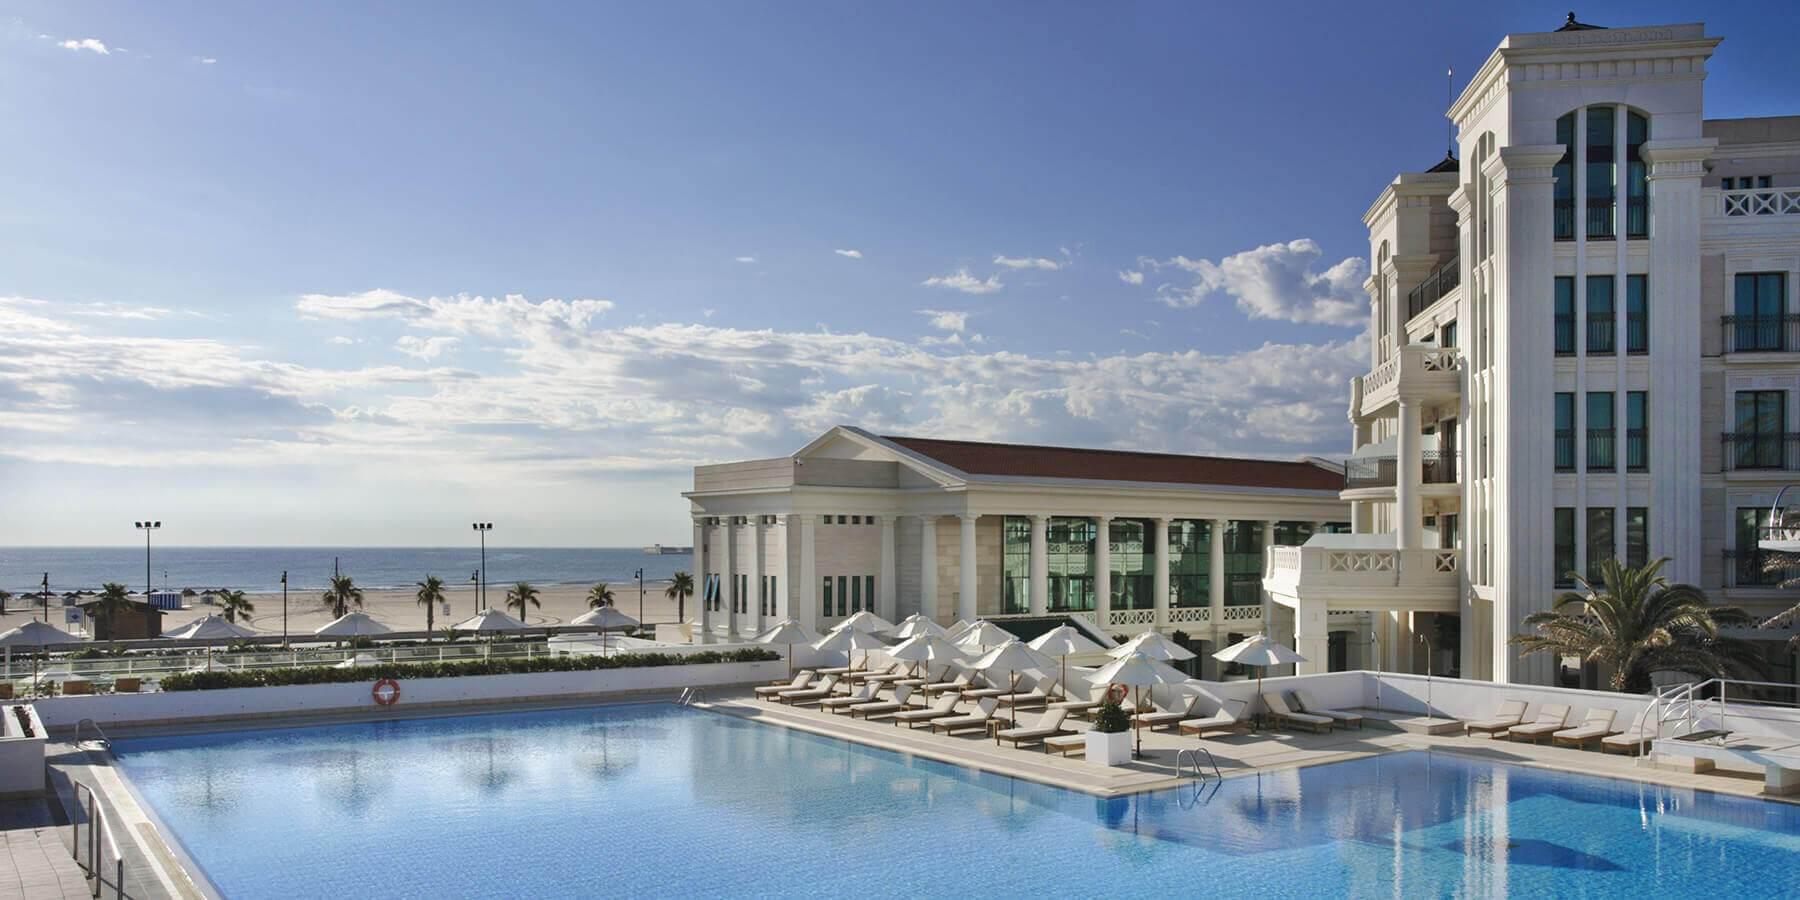 Hotel Balneario Las Arenas Valencia ***** | Official Website | Best